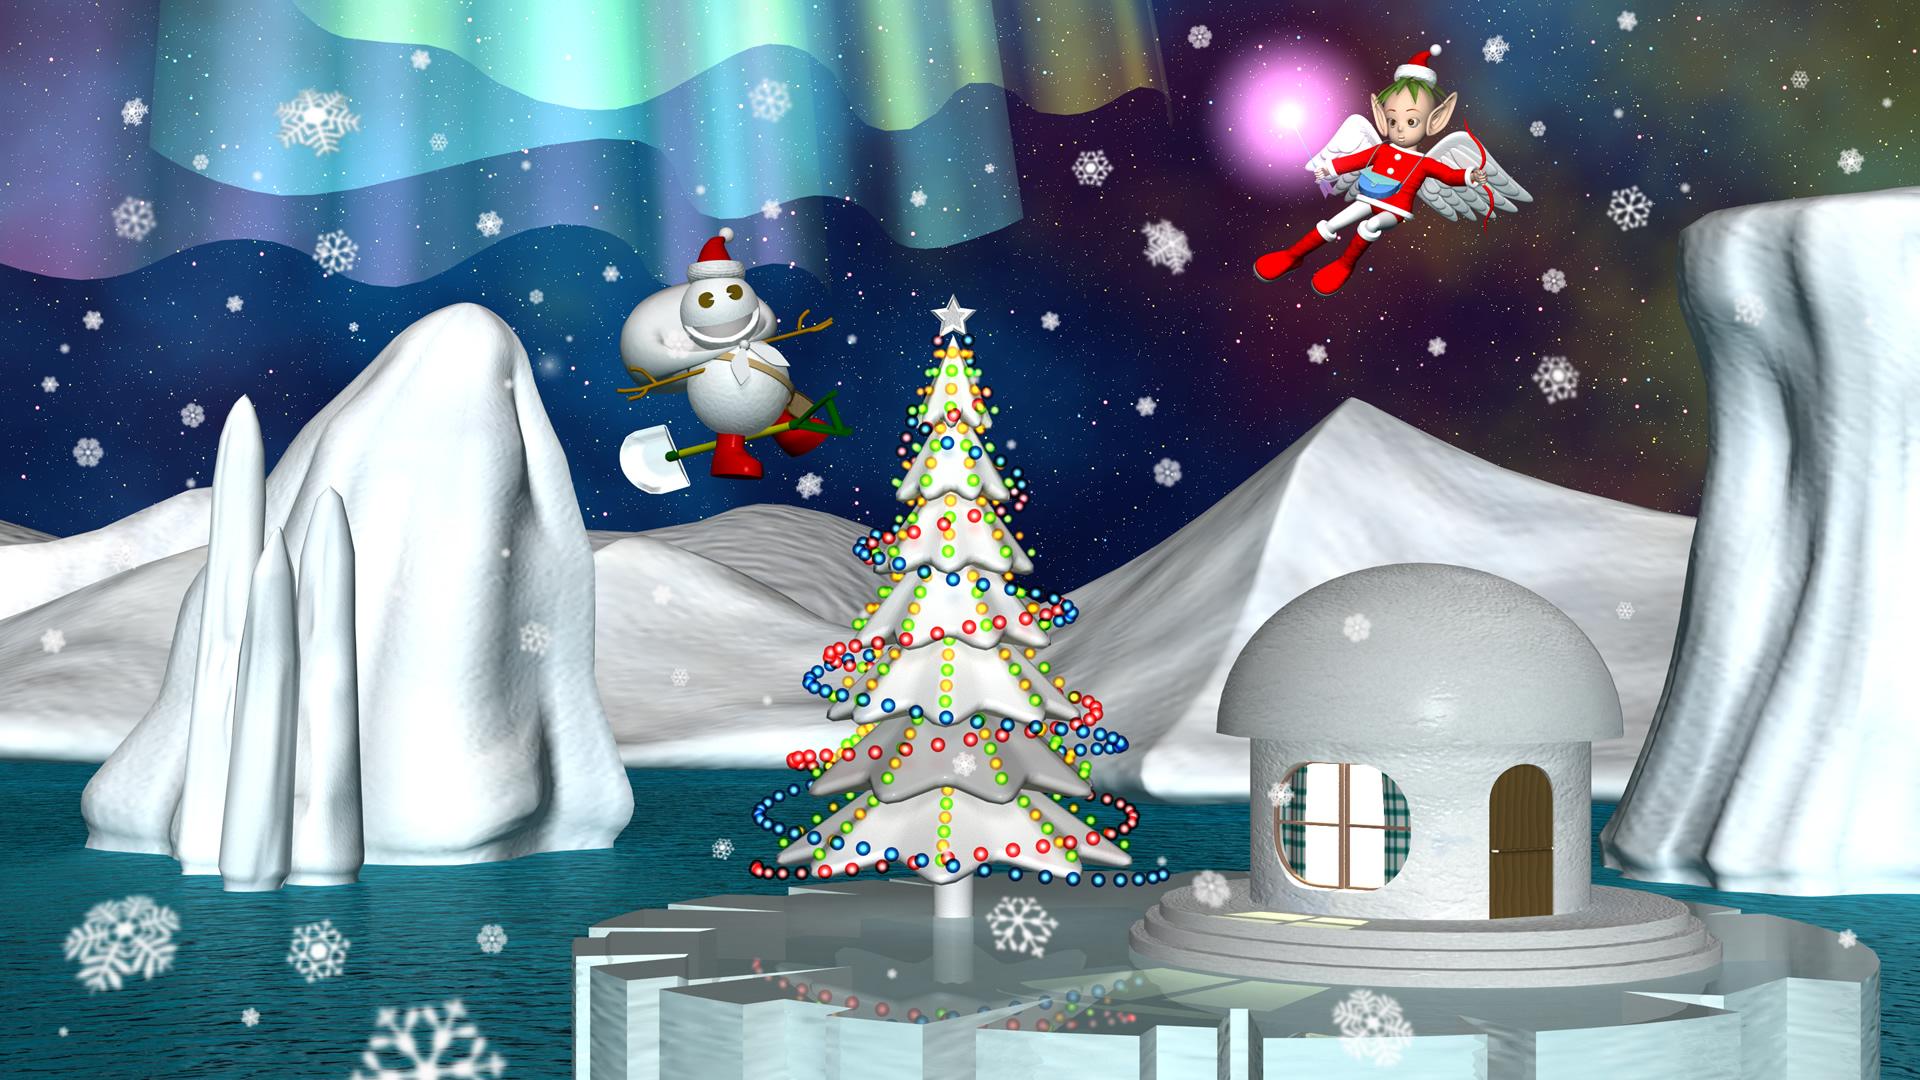 3DCG壁紙 スノーポストマン(雪だるま)とエンジェル